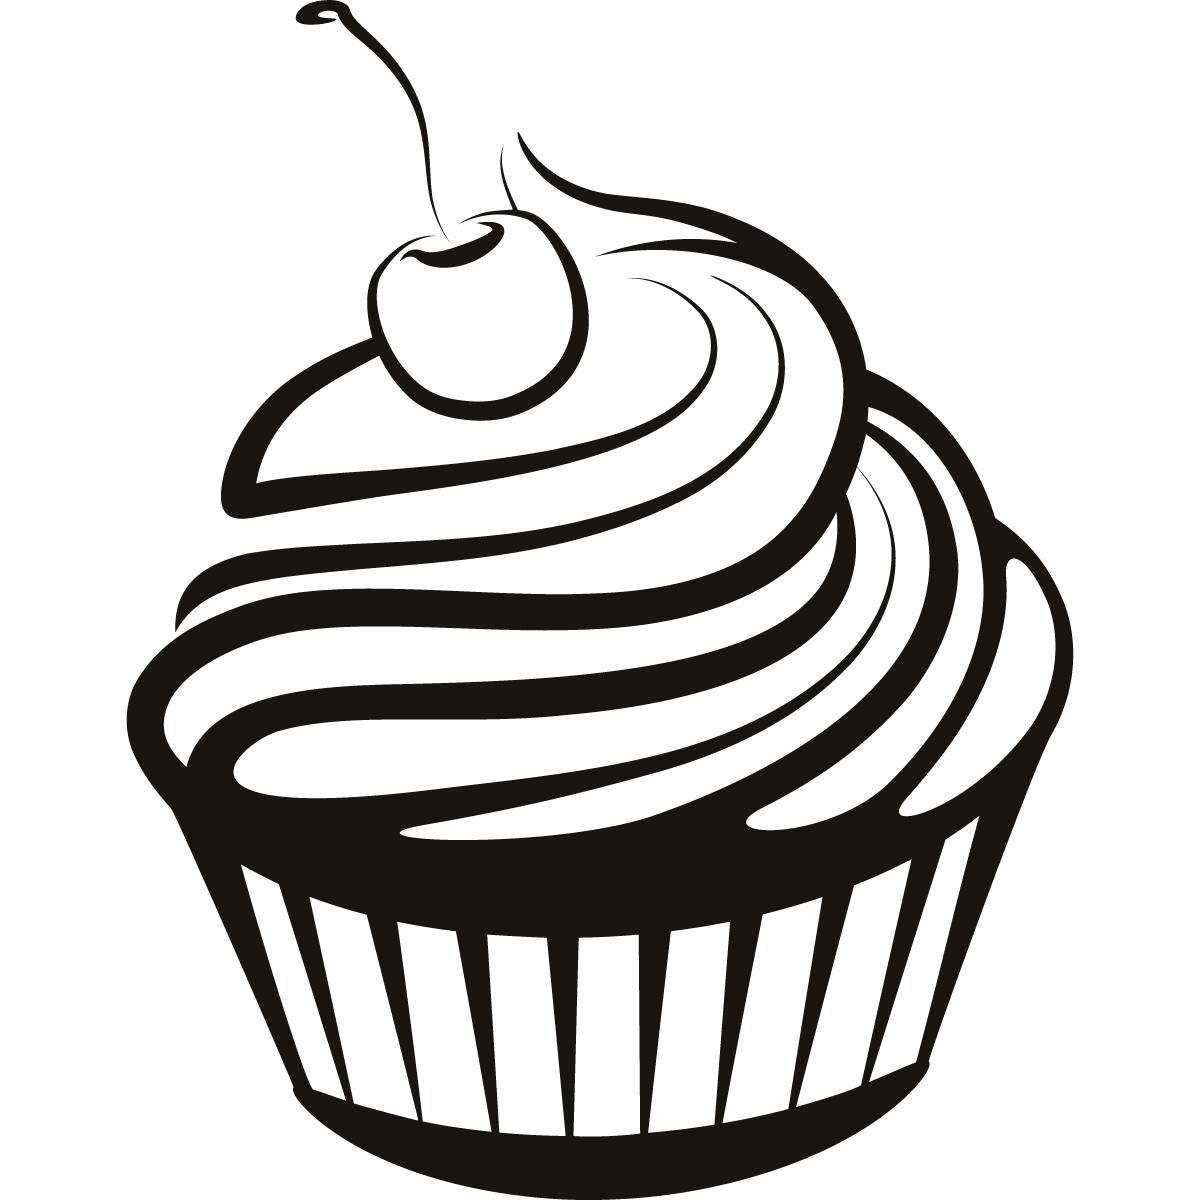 Free Cupcake Silhouette Download Free Clip Art Free